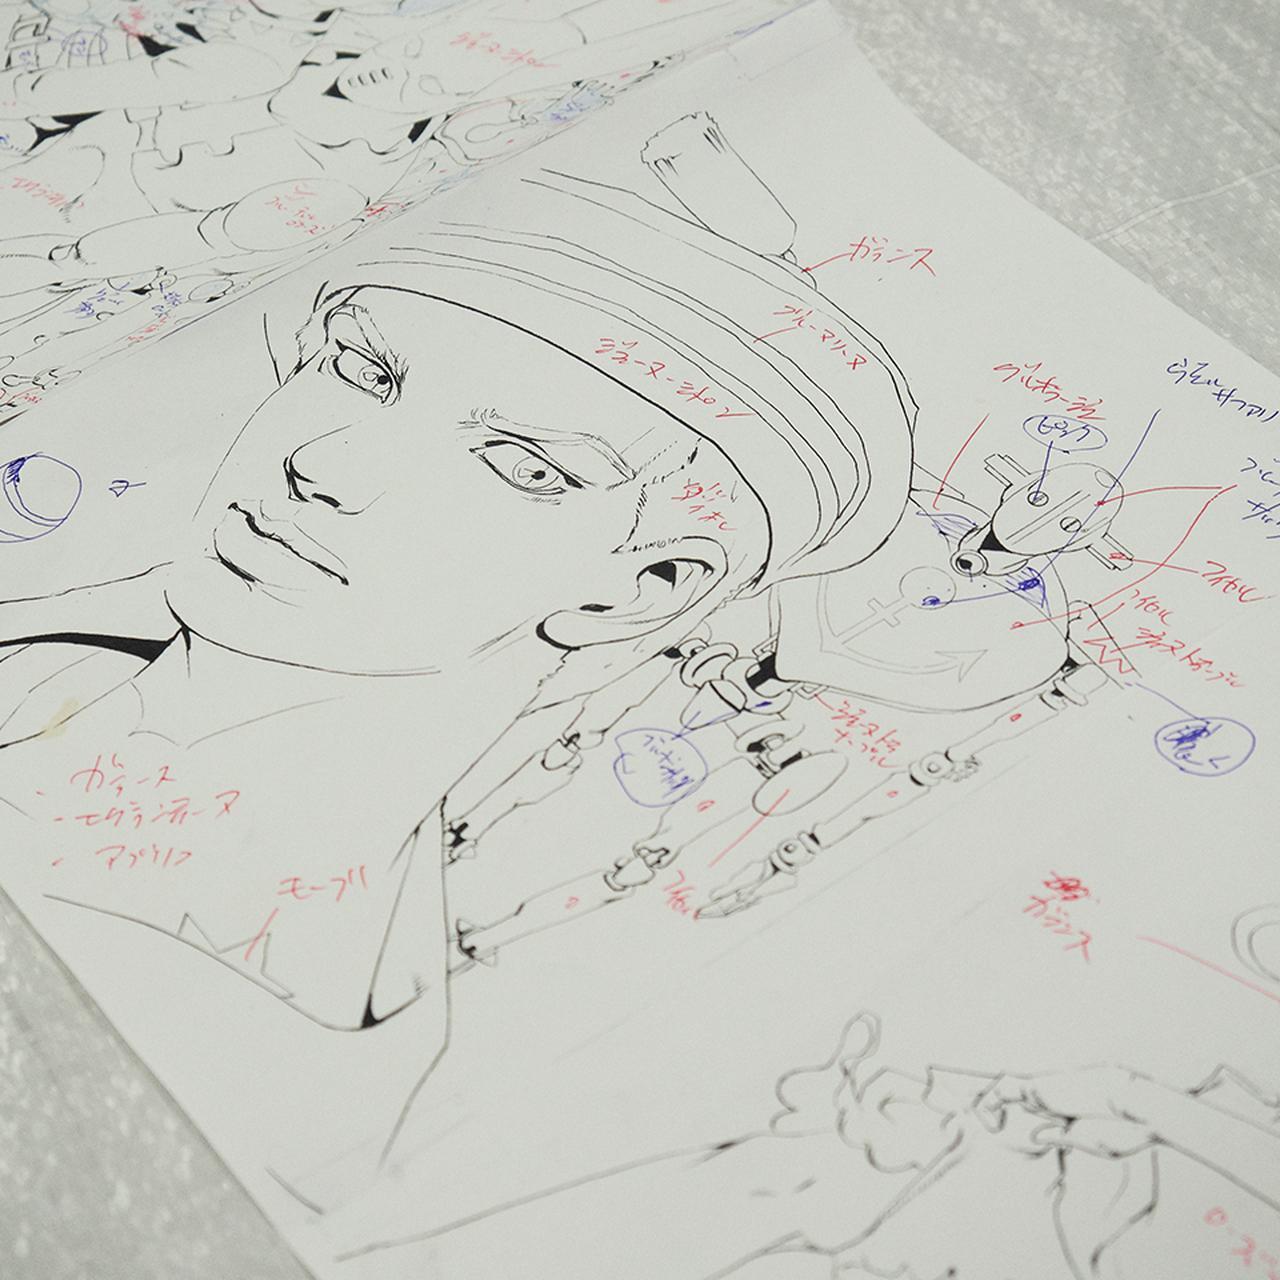 Images : 6番目の画像 - 「スペシャル インタビュー 漫画家・荒木飛呂彦の化学反応」のアルバム - T JAPAN:The New York Times Style Magazine 公式サイト